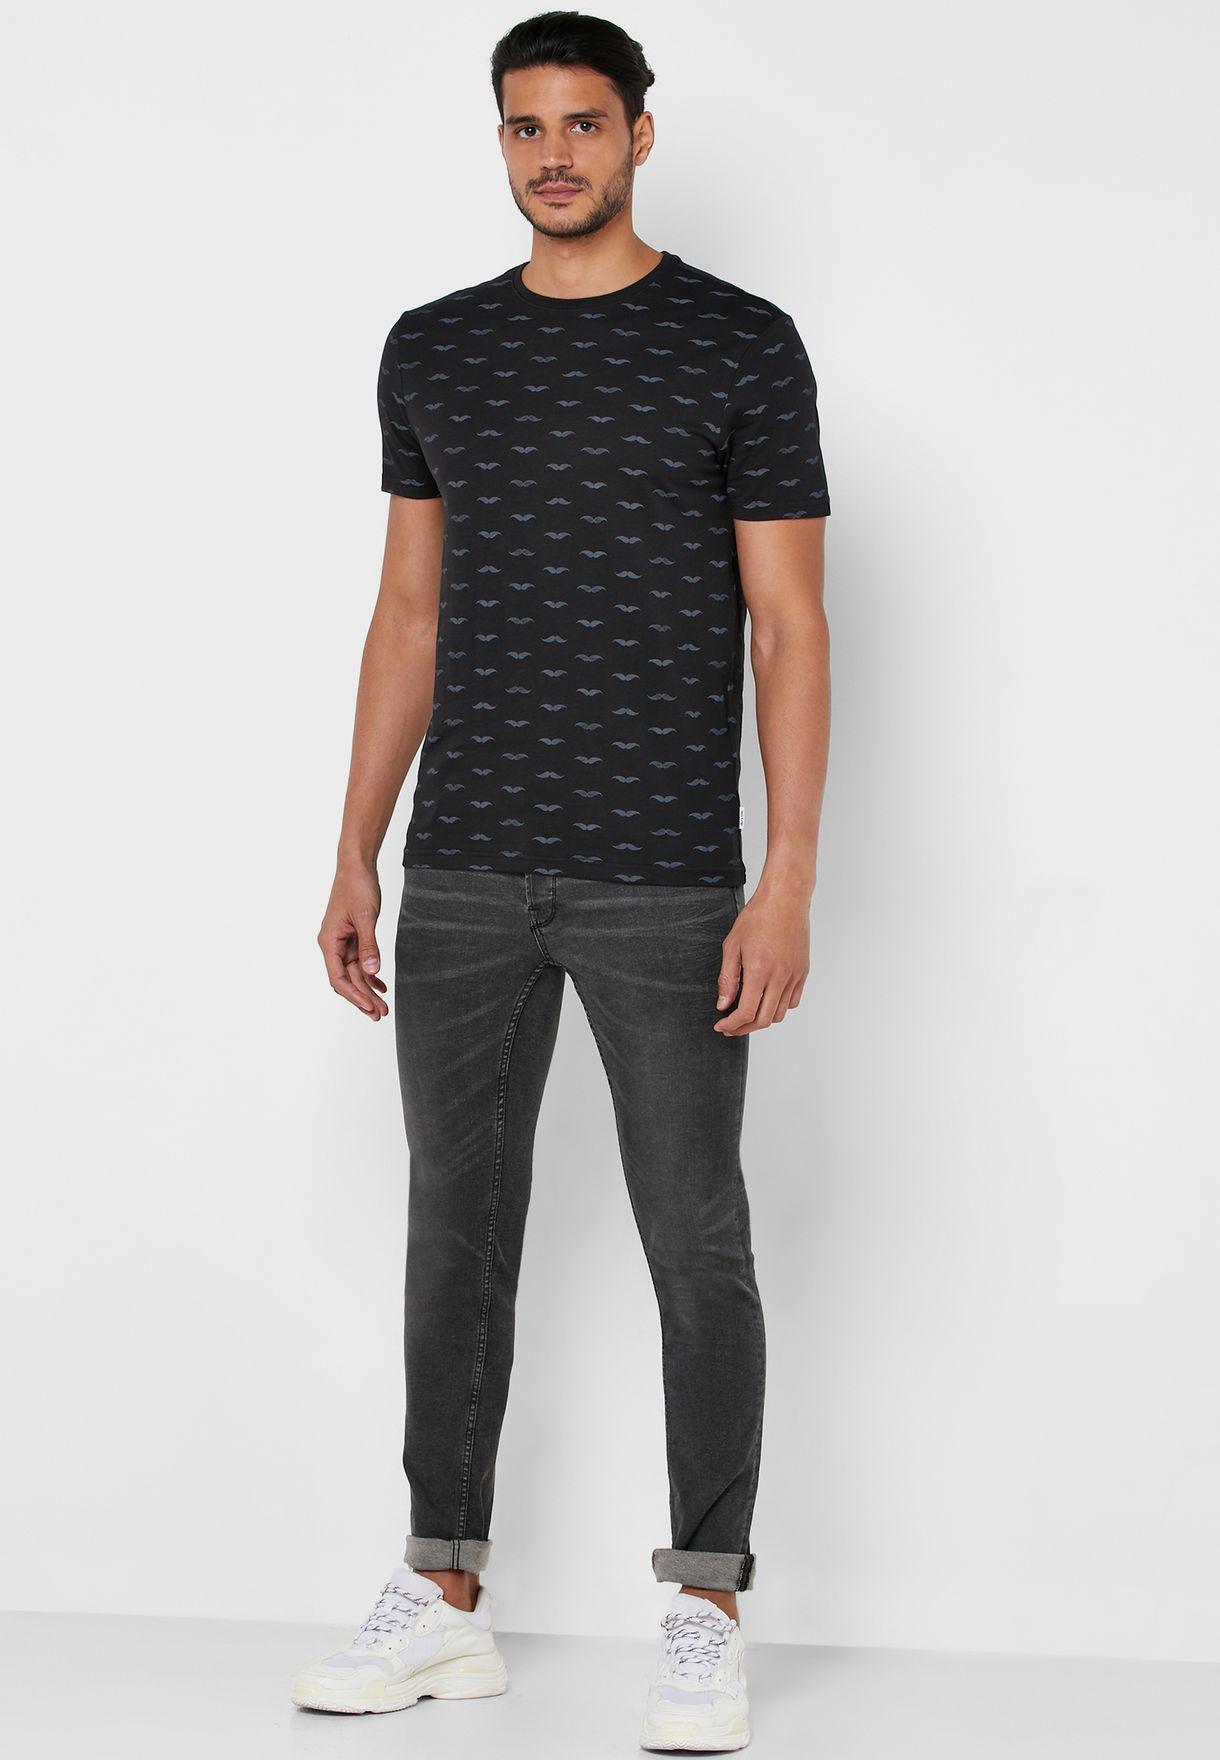 Mseaton AOP Crew Neck T-Shirt